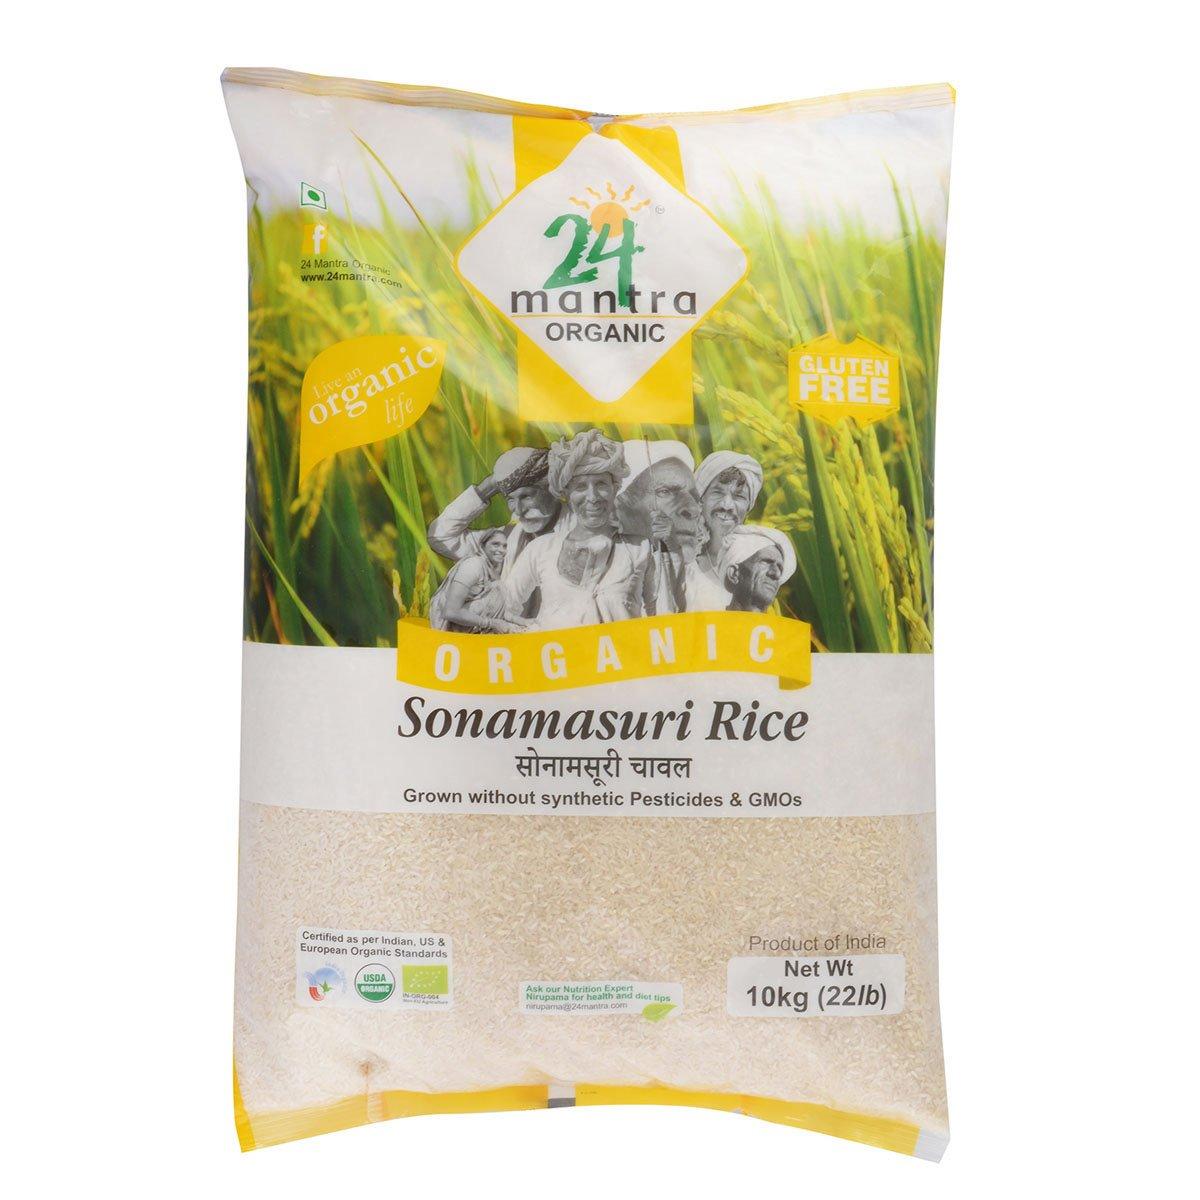 24 Mantra organic sonamasuri white rice